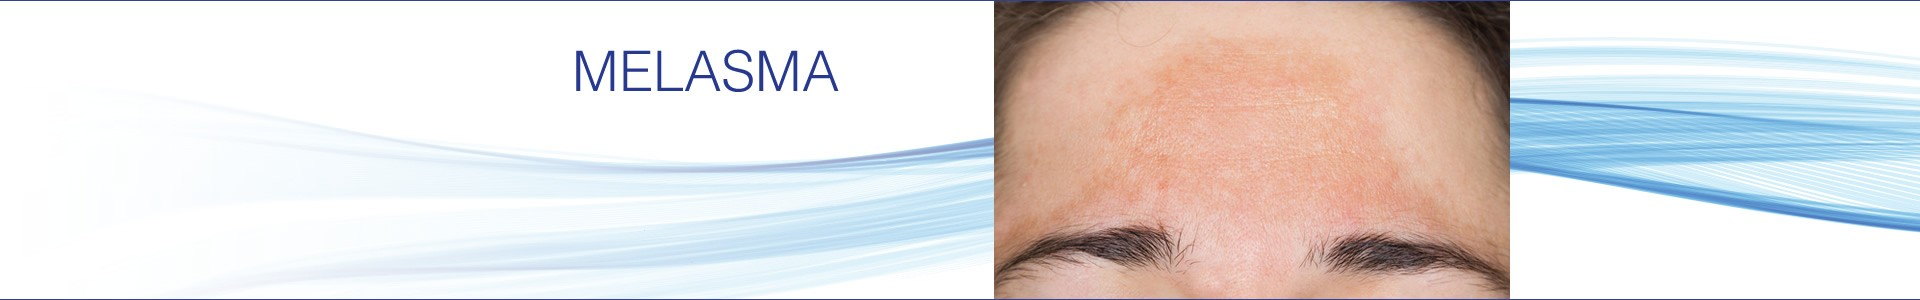 Melasma - Smooth Skin Health Centre Hamilton